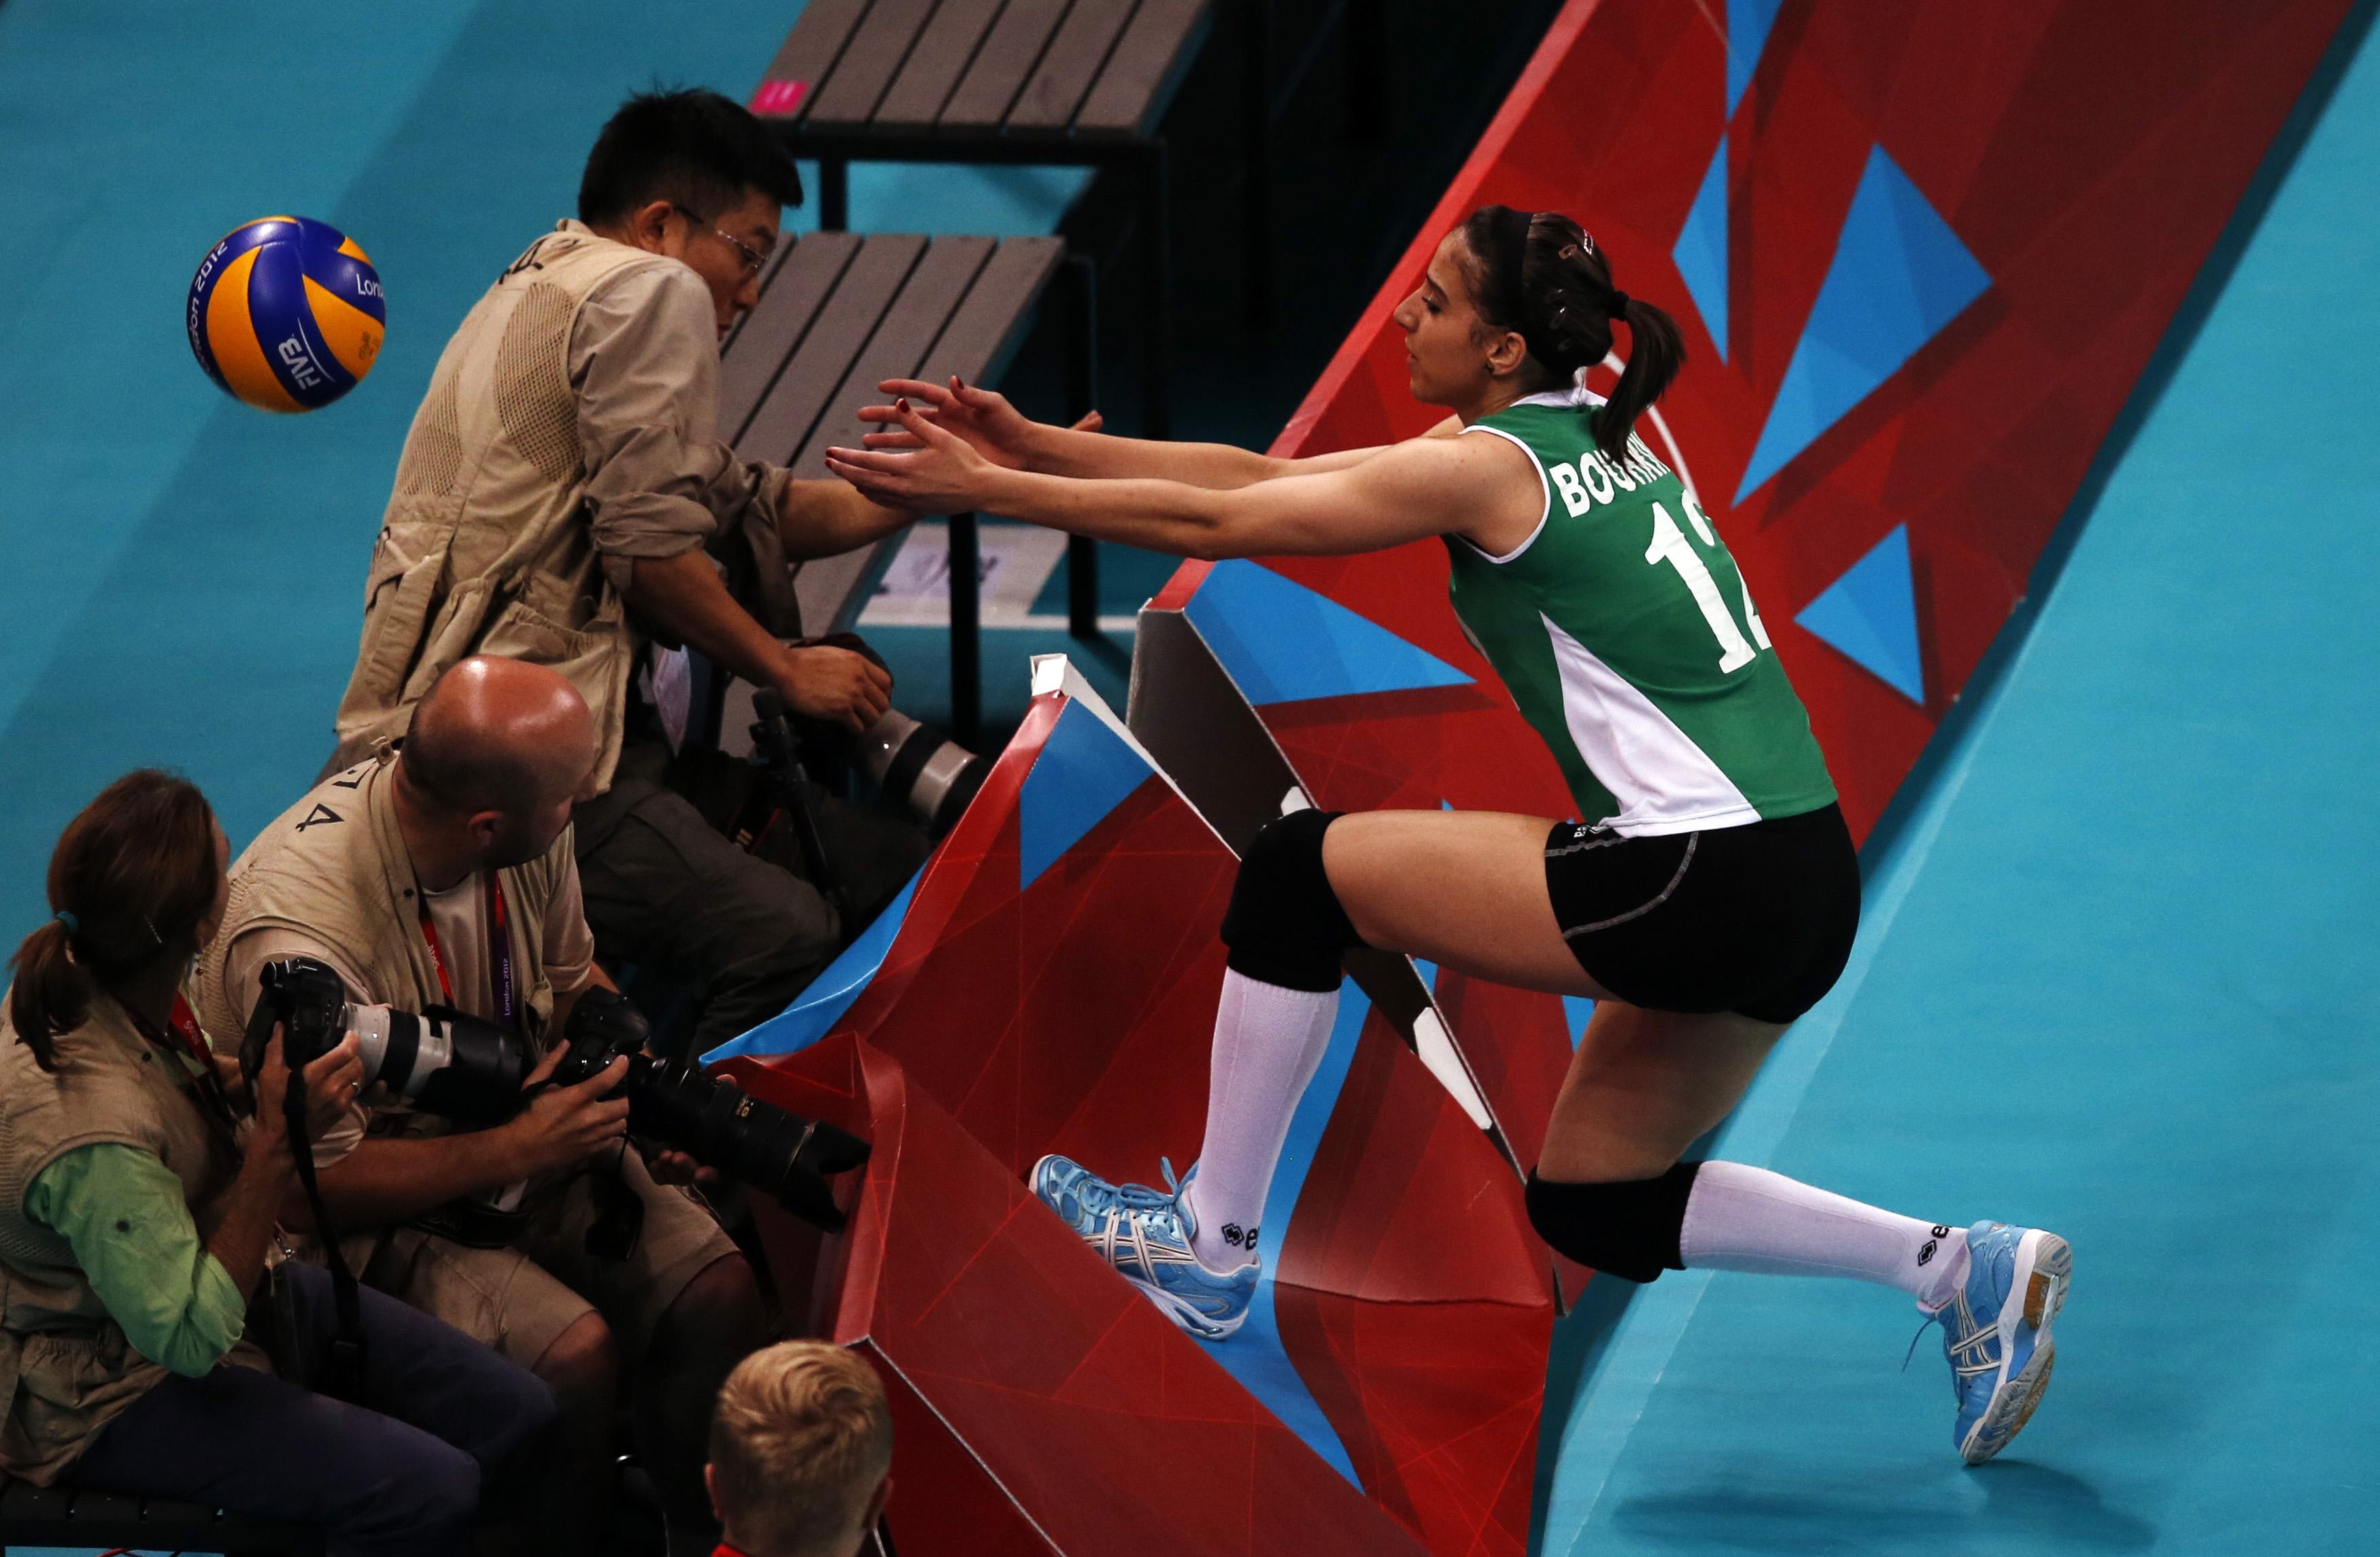 Oops Moments in Women's Sports